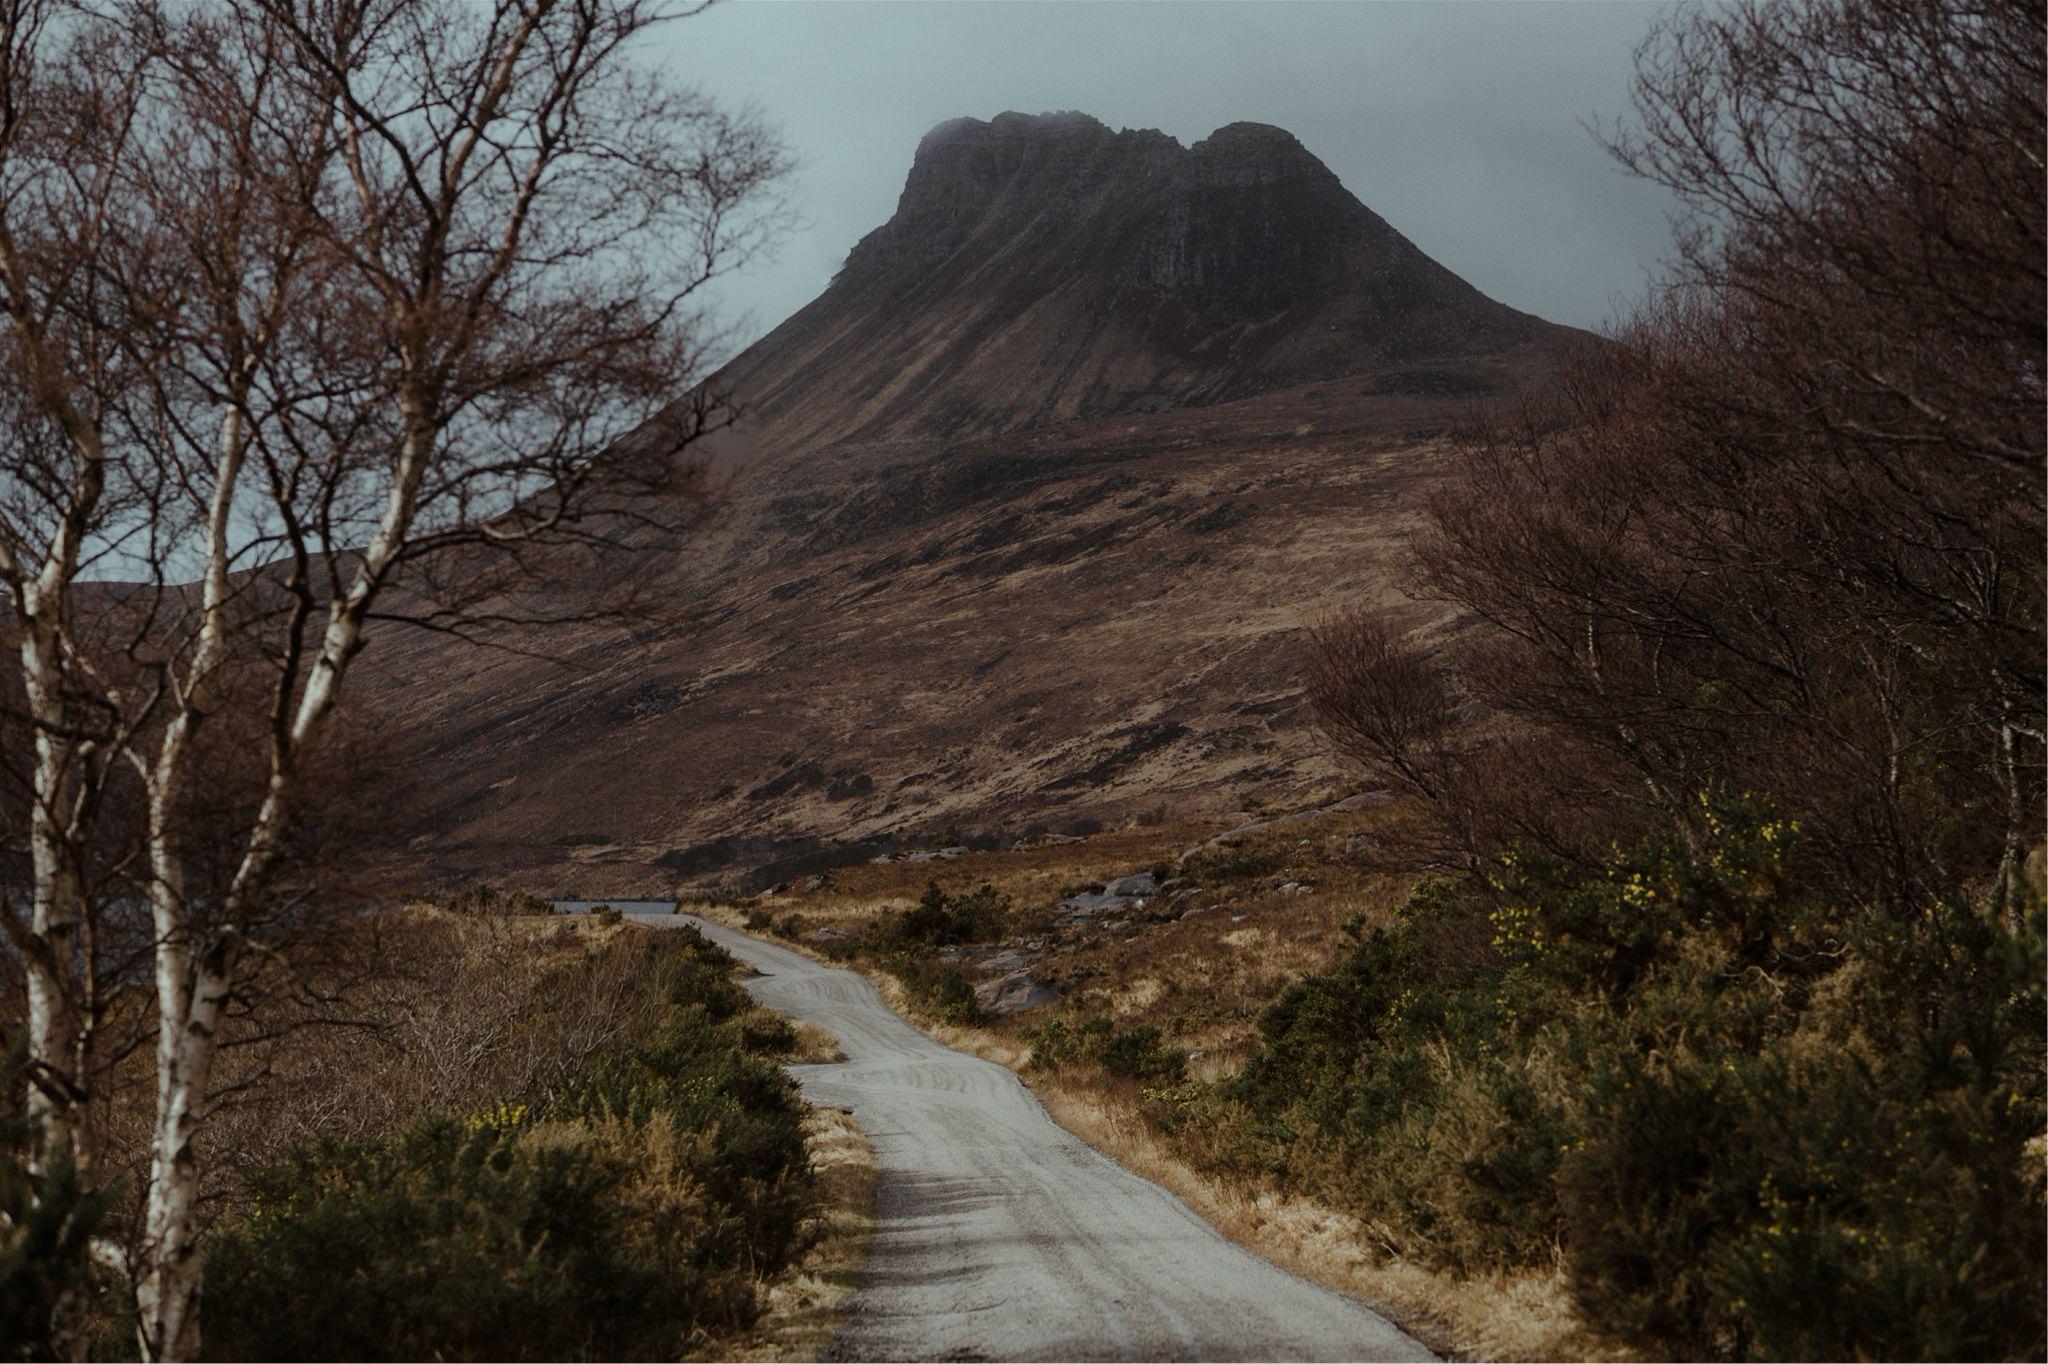 Road running towards a mountain in Assynt, Scotland